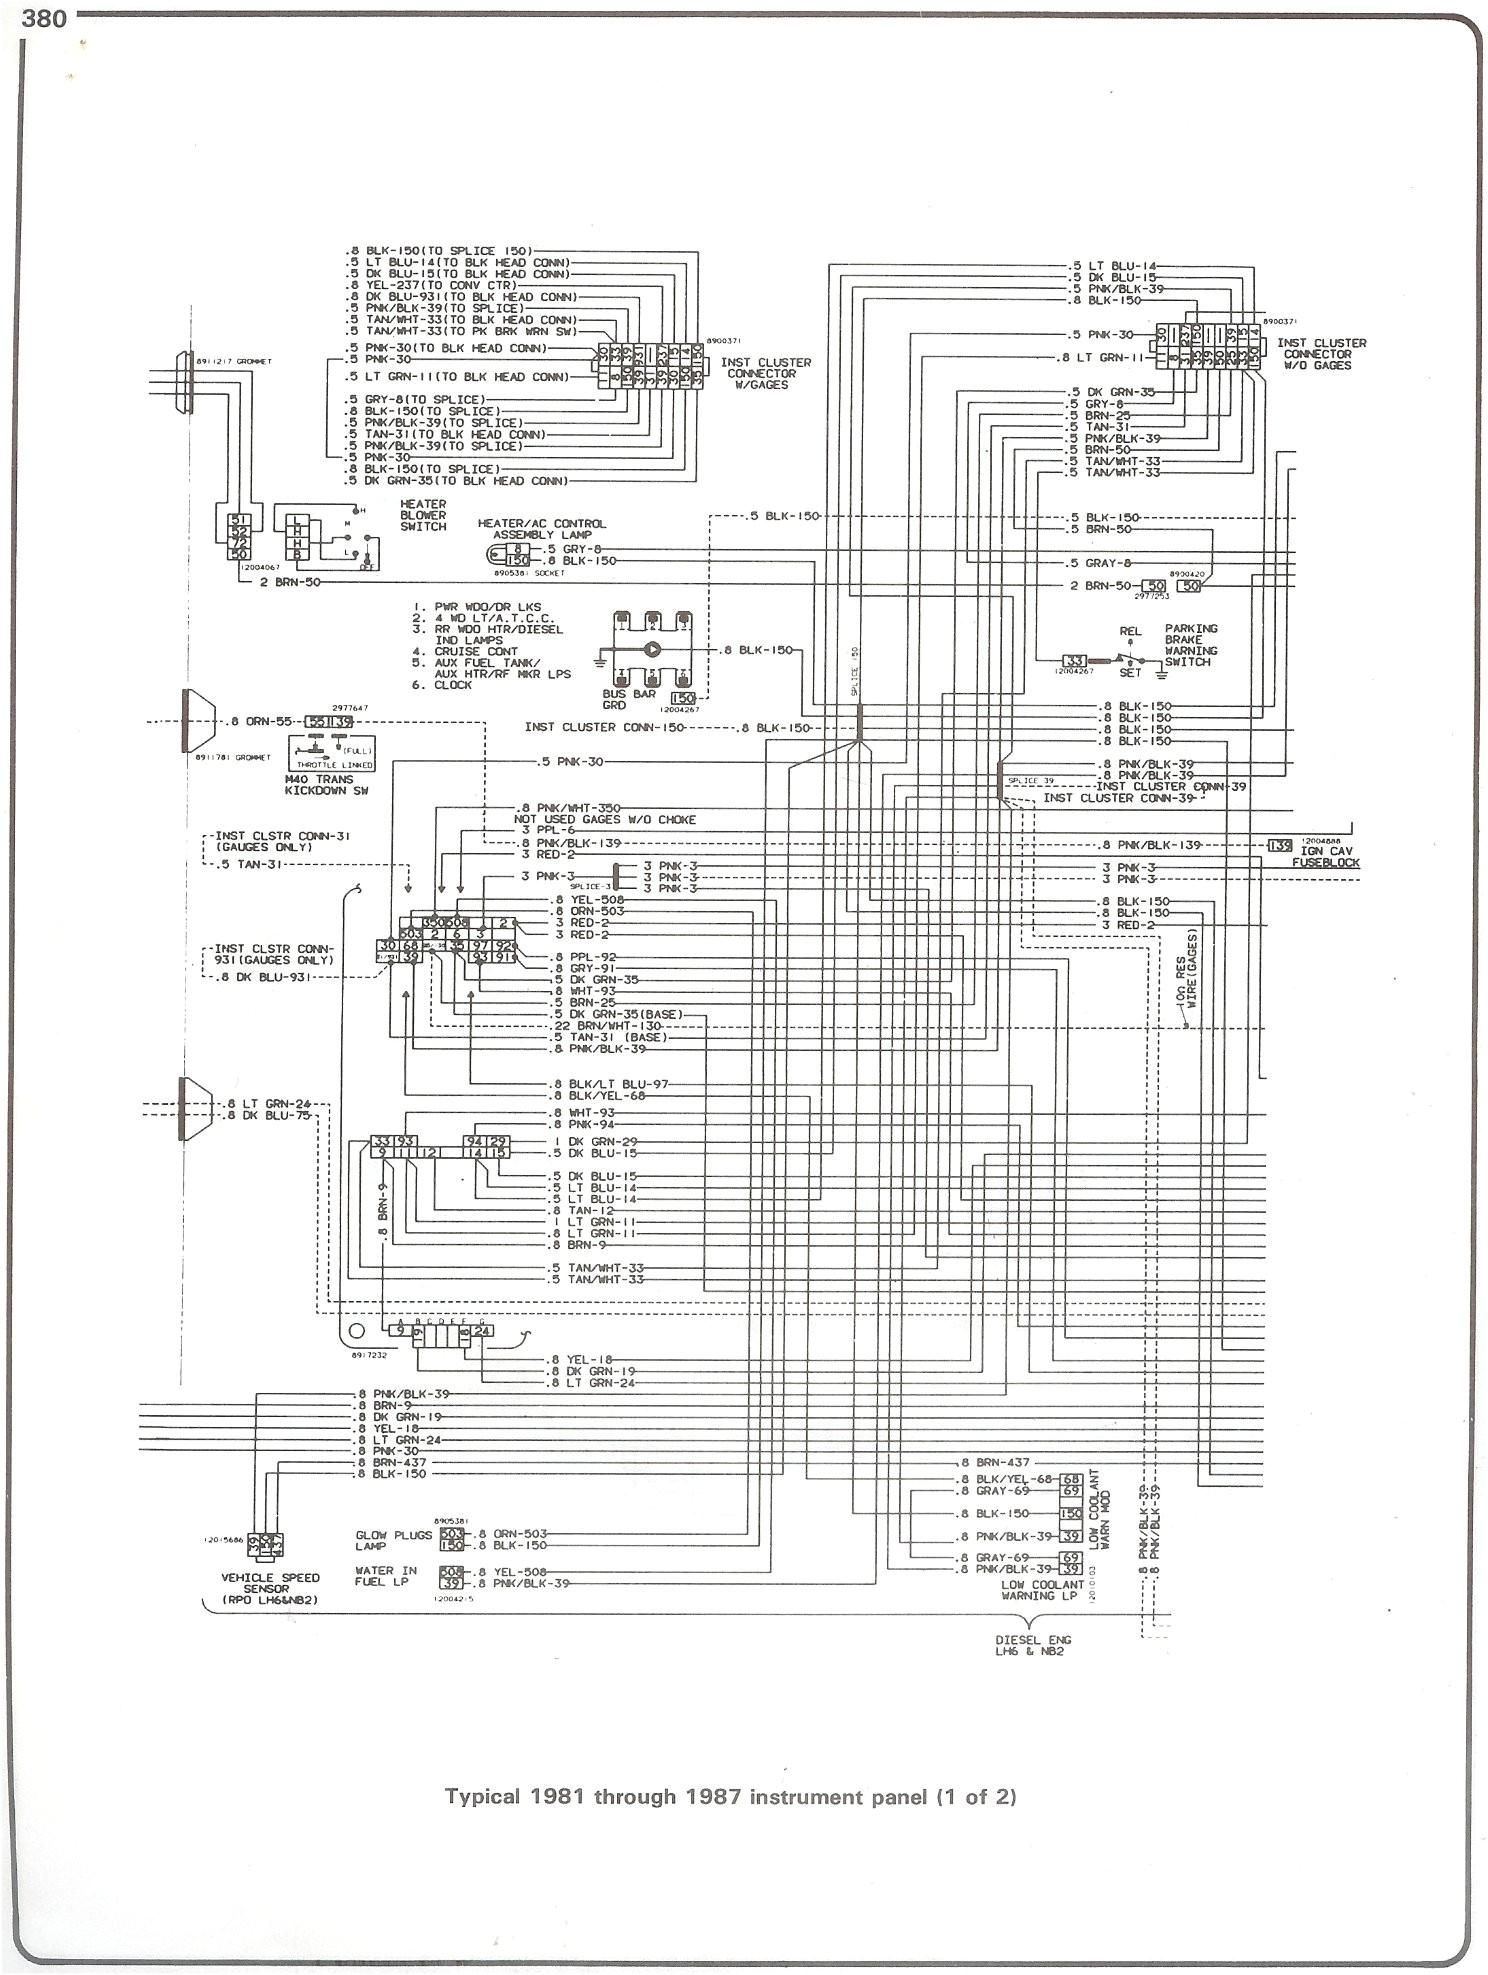 alternator wiring diagram chevy s10 valid 84 chevy truck wiring harness chevy wiring harness diagram wiring of alternator wiring diagram chevy s10 on 1984 chevy truck wiring diagram jpg